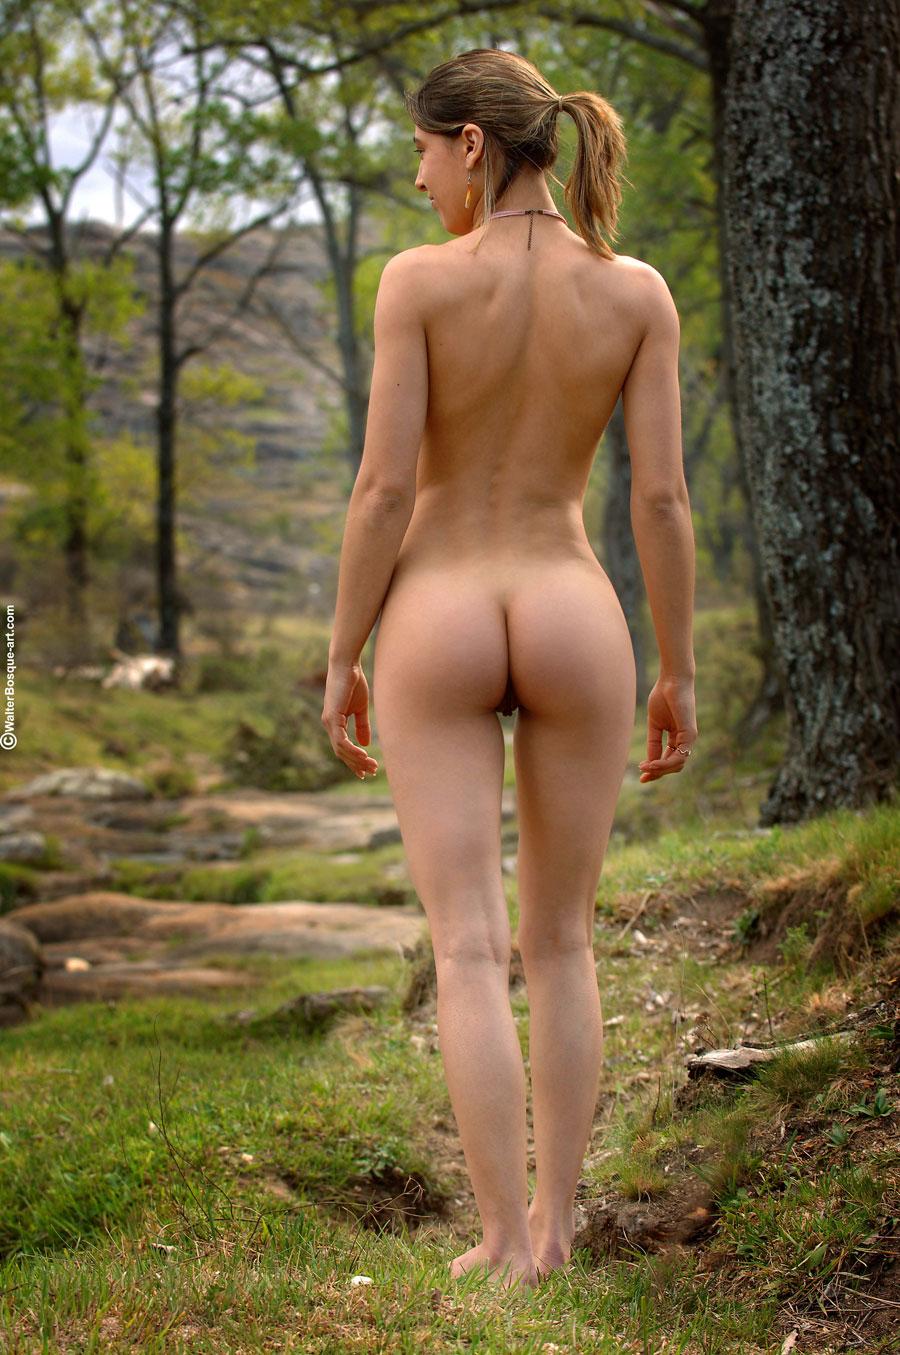 Flaca Desnuda Vulva Vagina B